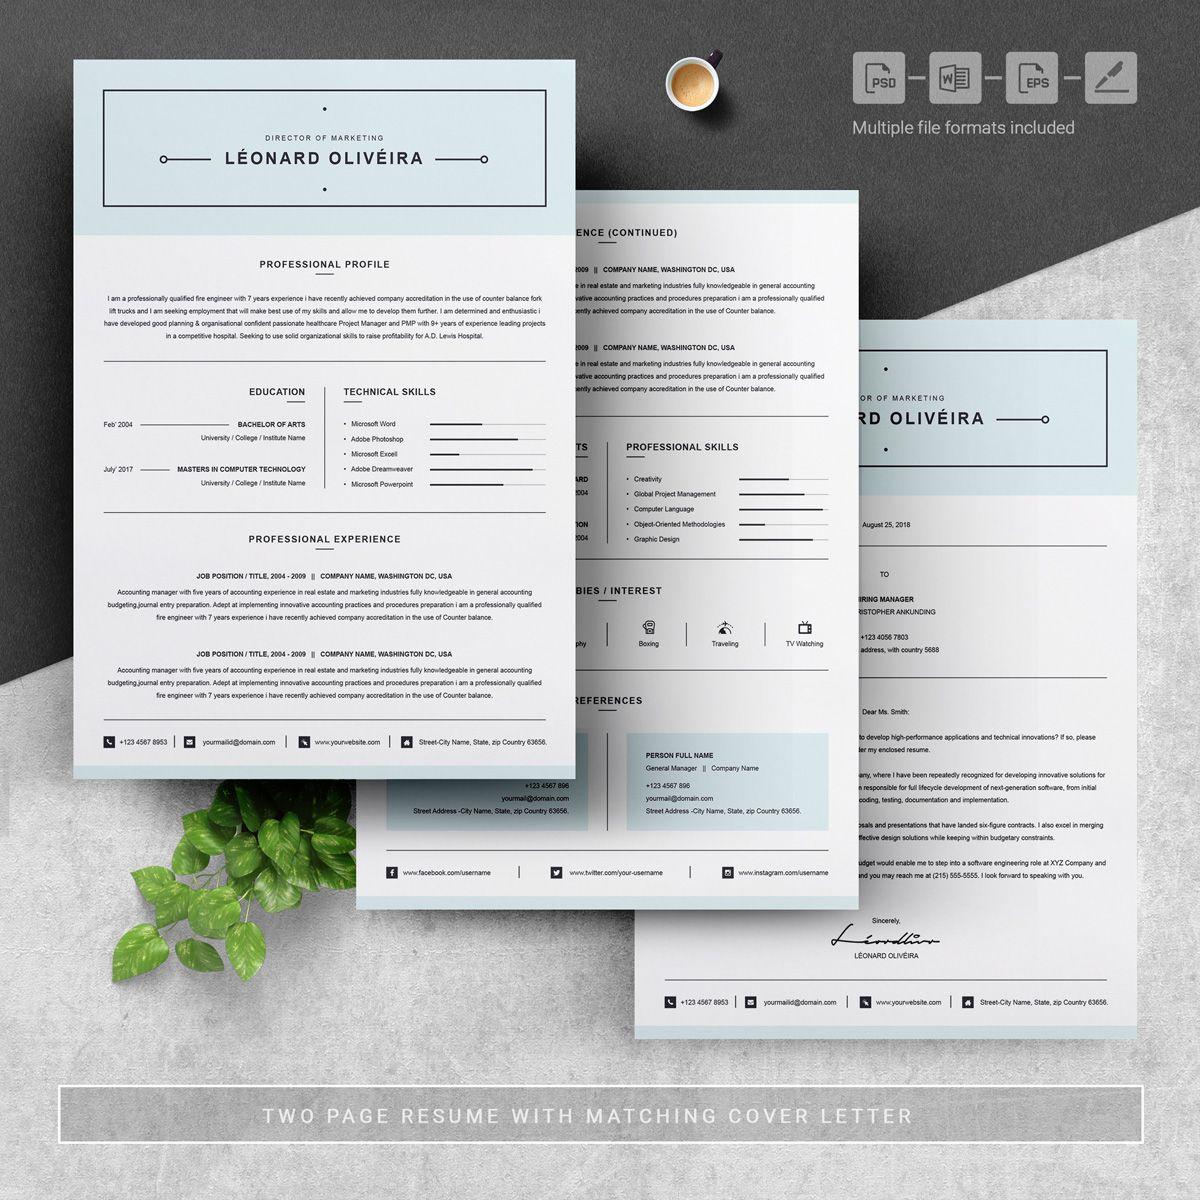 Leonard Resume Template 75230 Resume, Resume design